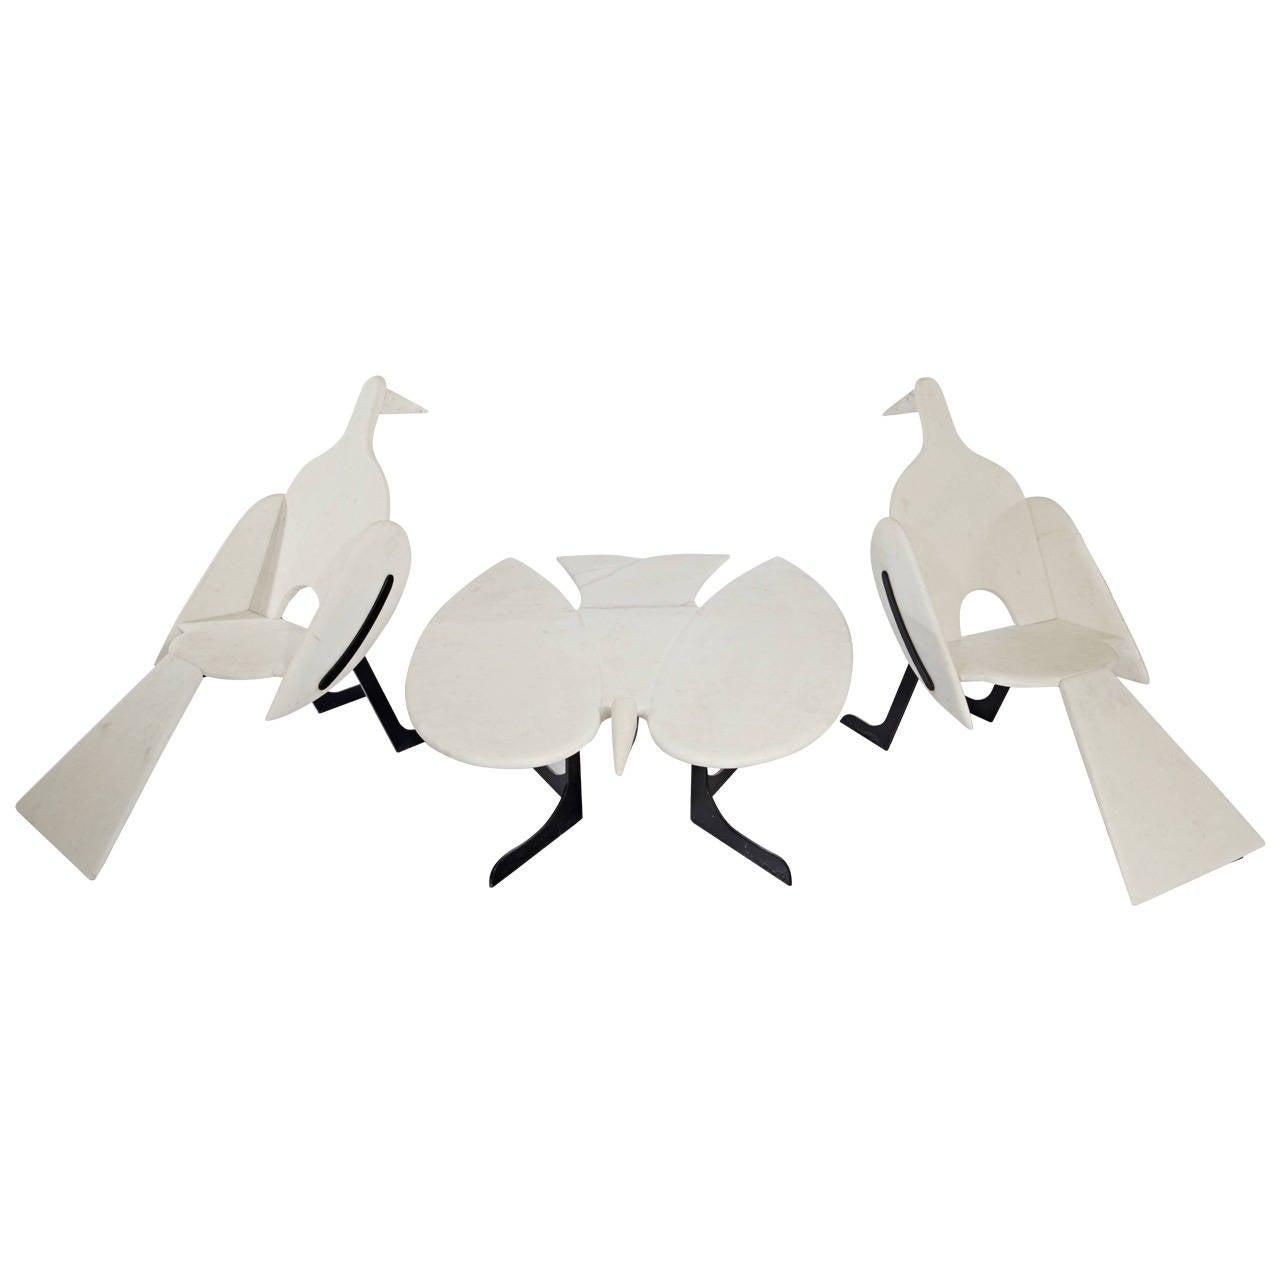 François-Xavier Lalanne Oiseaux de Marbre trio, late 20th century, offered by Galerie XX